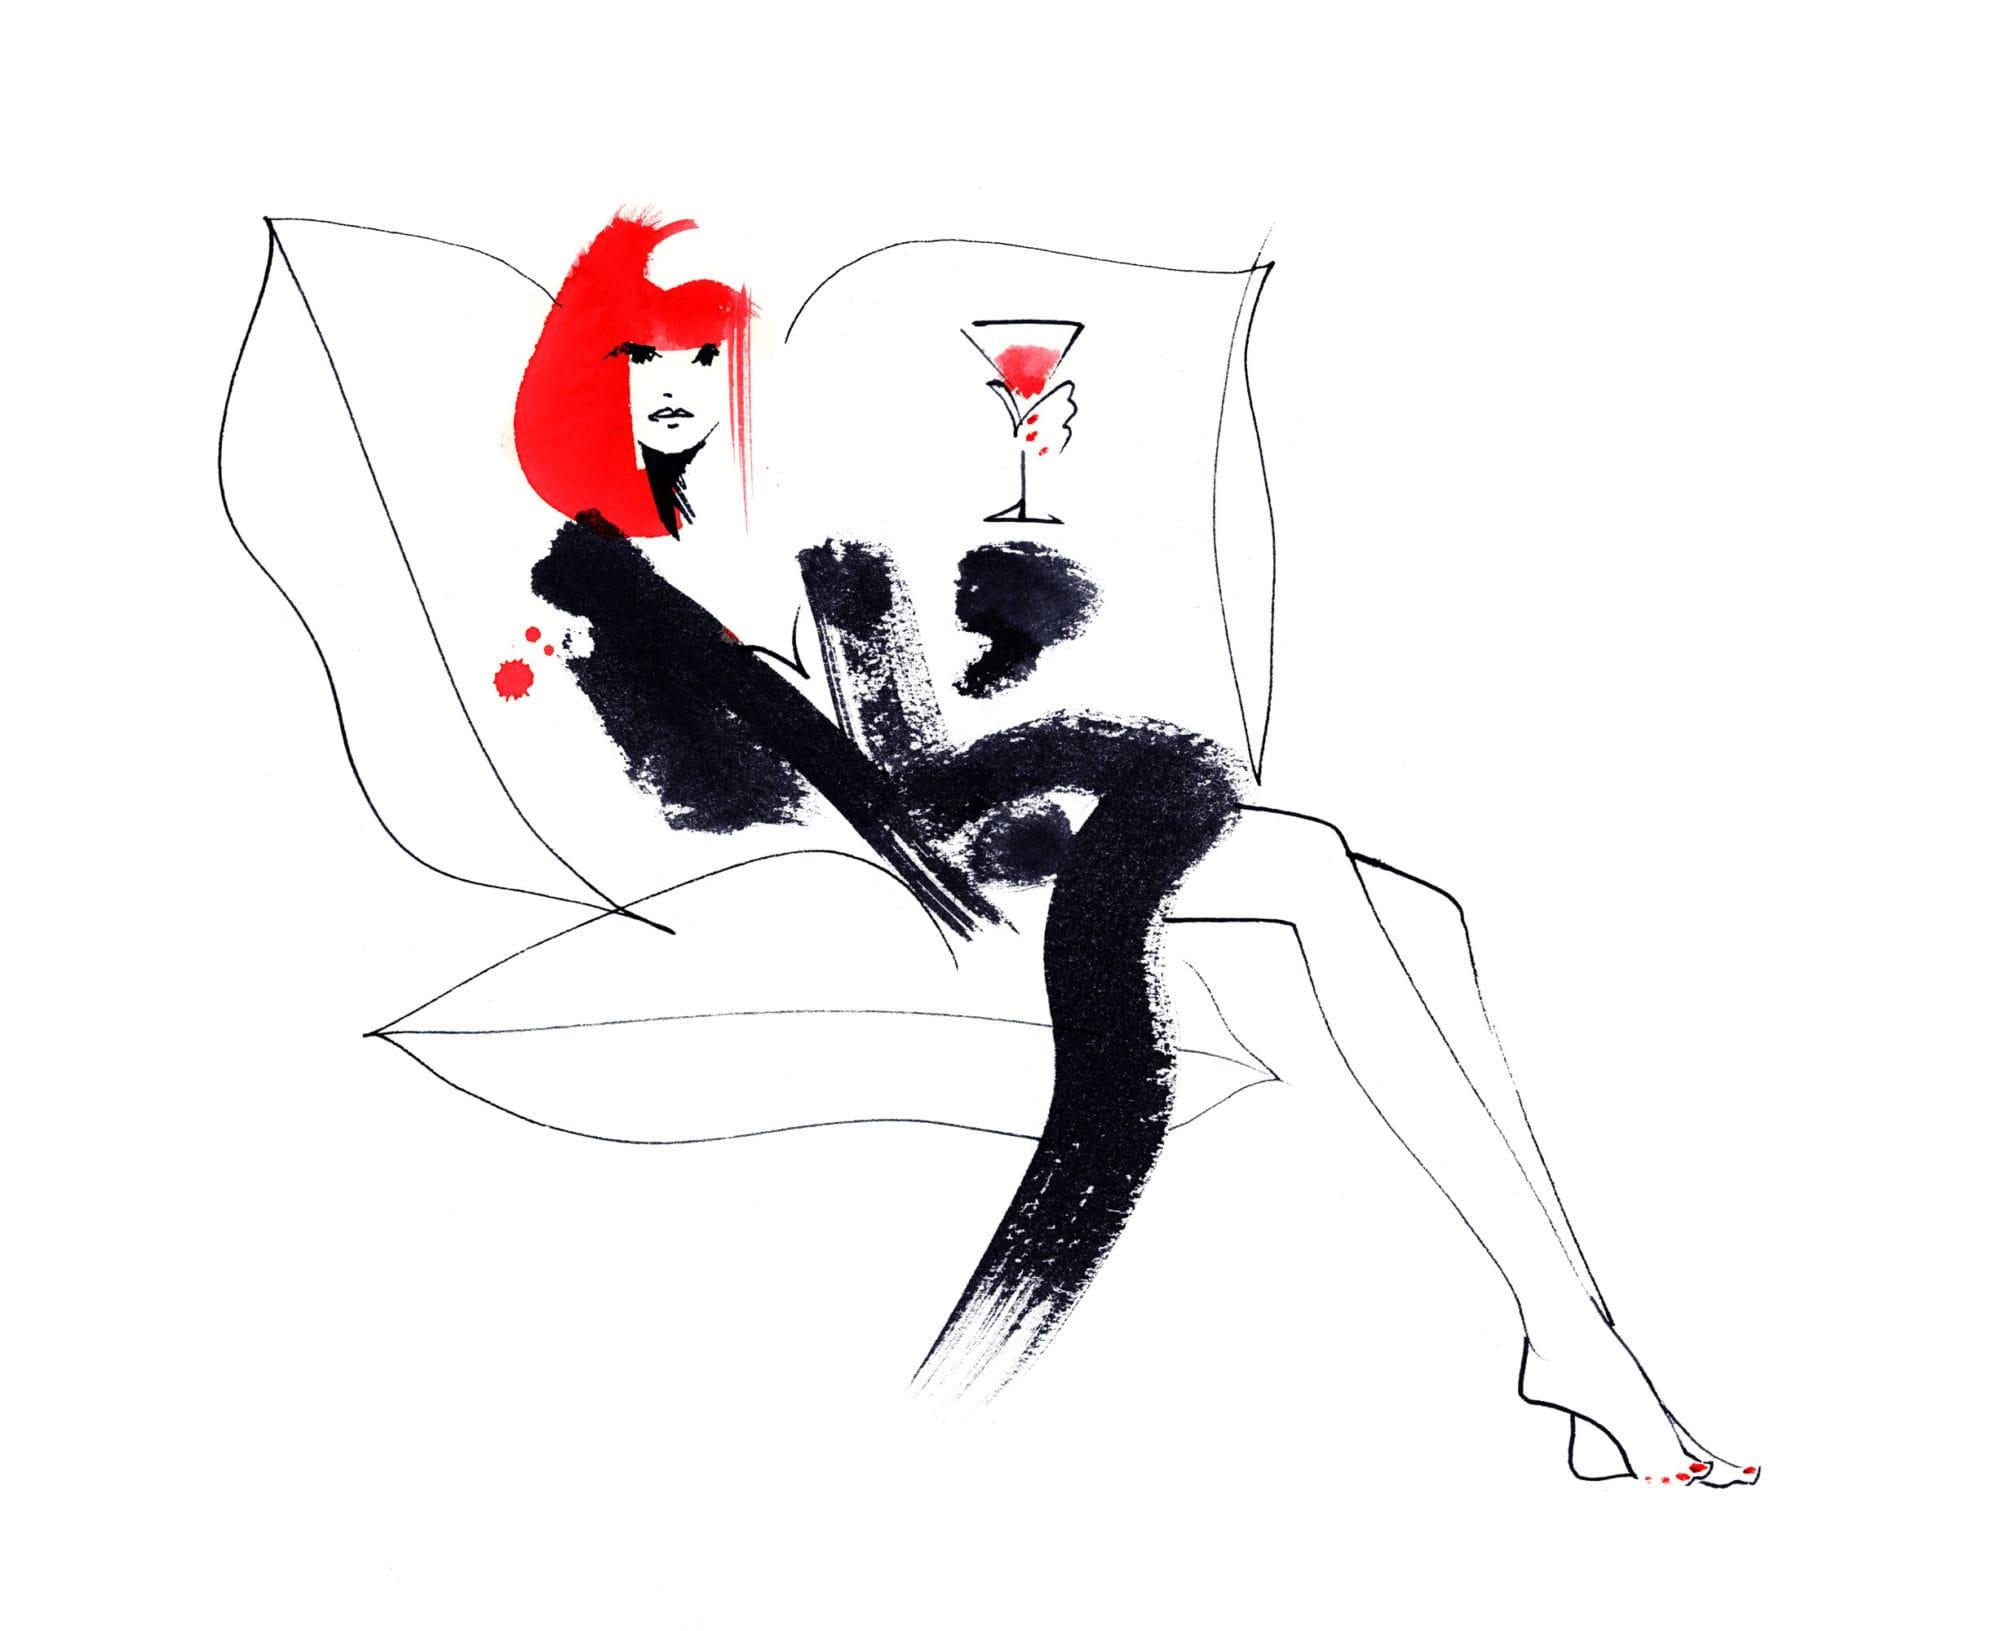 Lovisa Burfitt illustration La-rousse-et-boisson-rouge